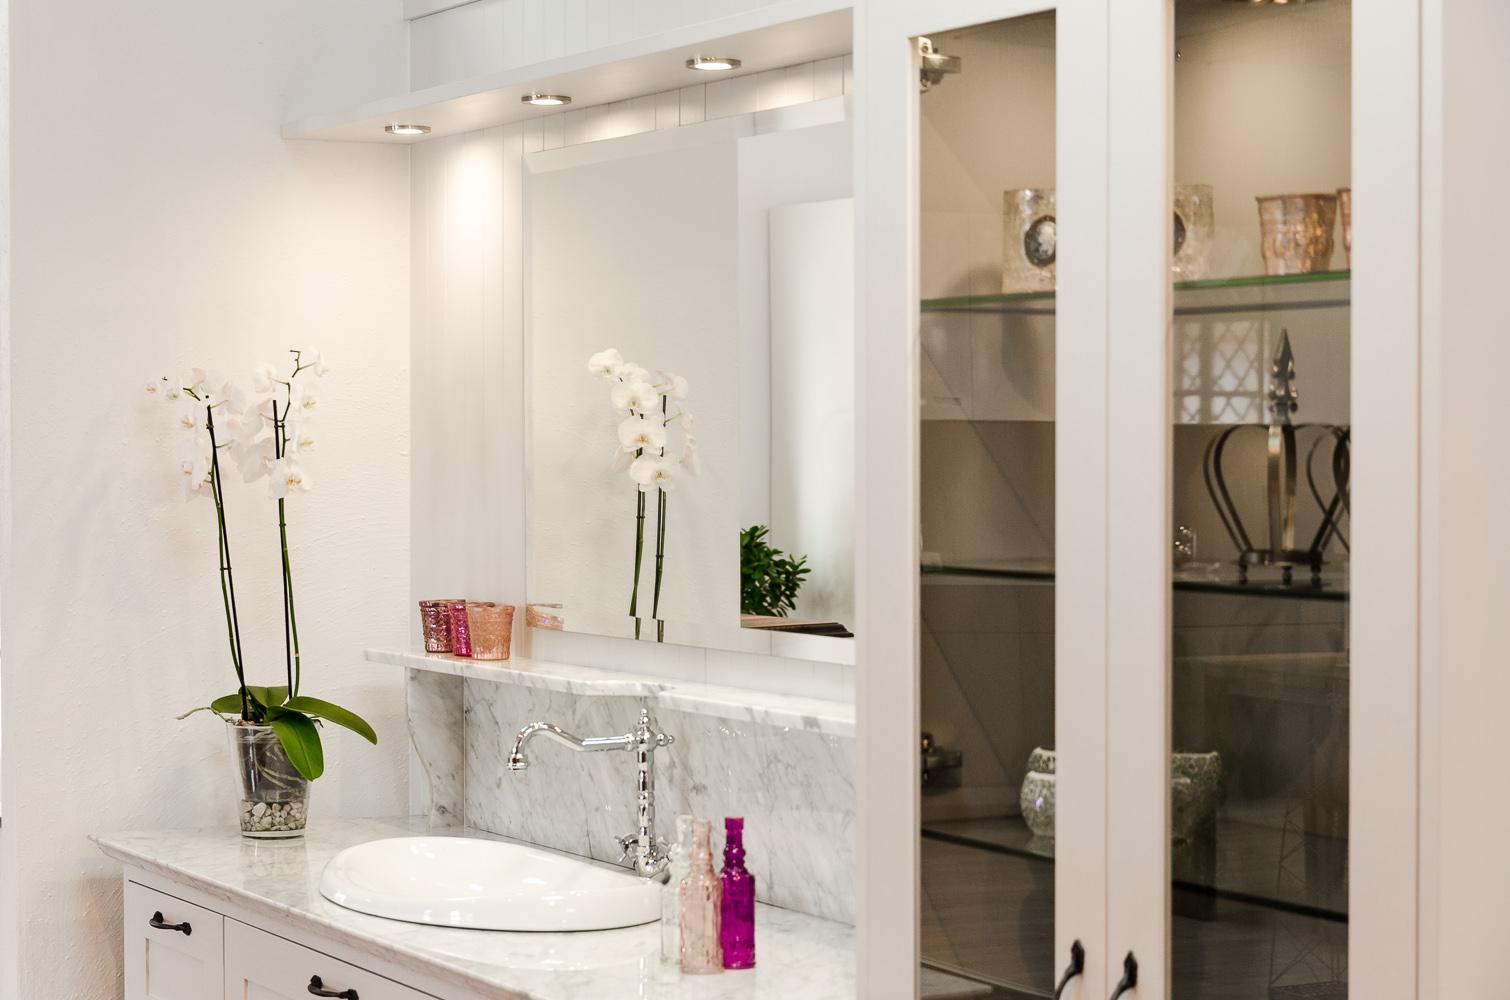 Copenhagen Madera Clic Bathroom Set